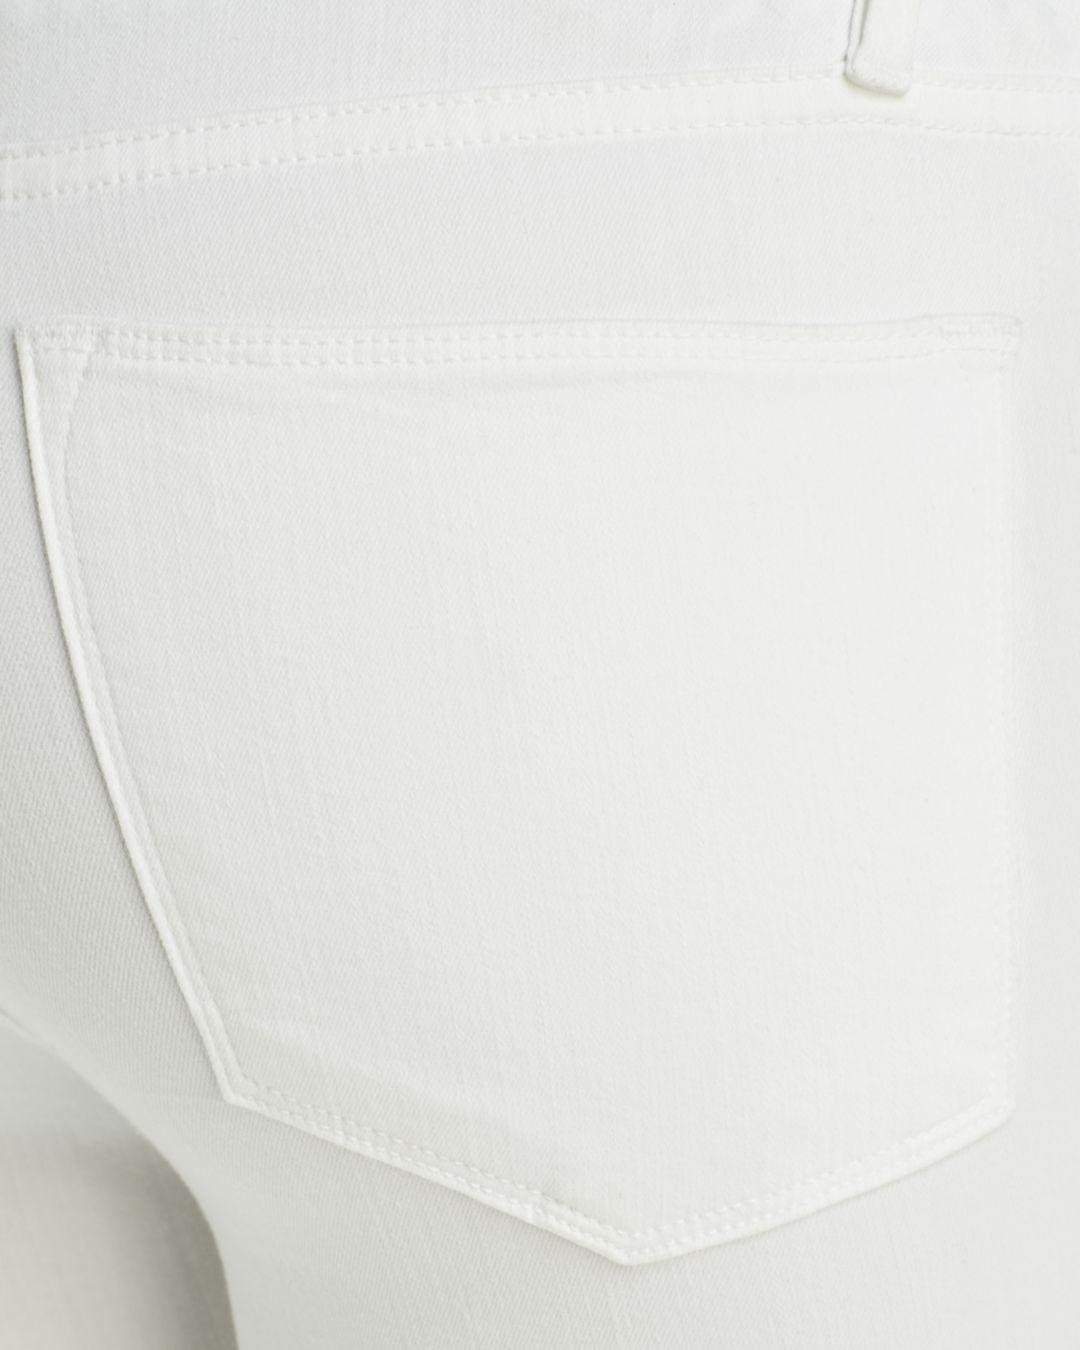 FRAME Denim Le High Shredded Raw-edge Skinny Jeans In Blanc in White